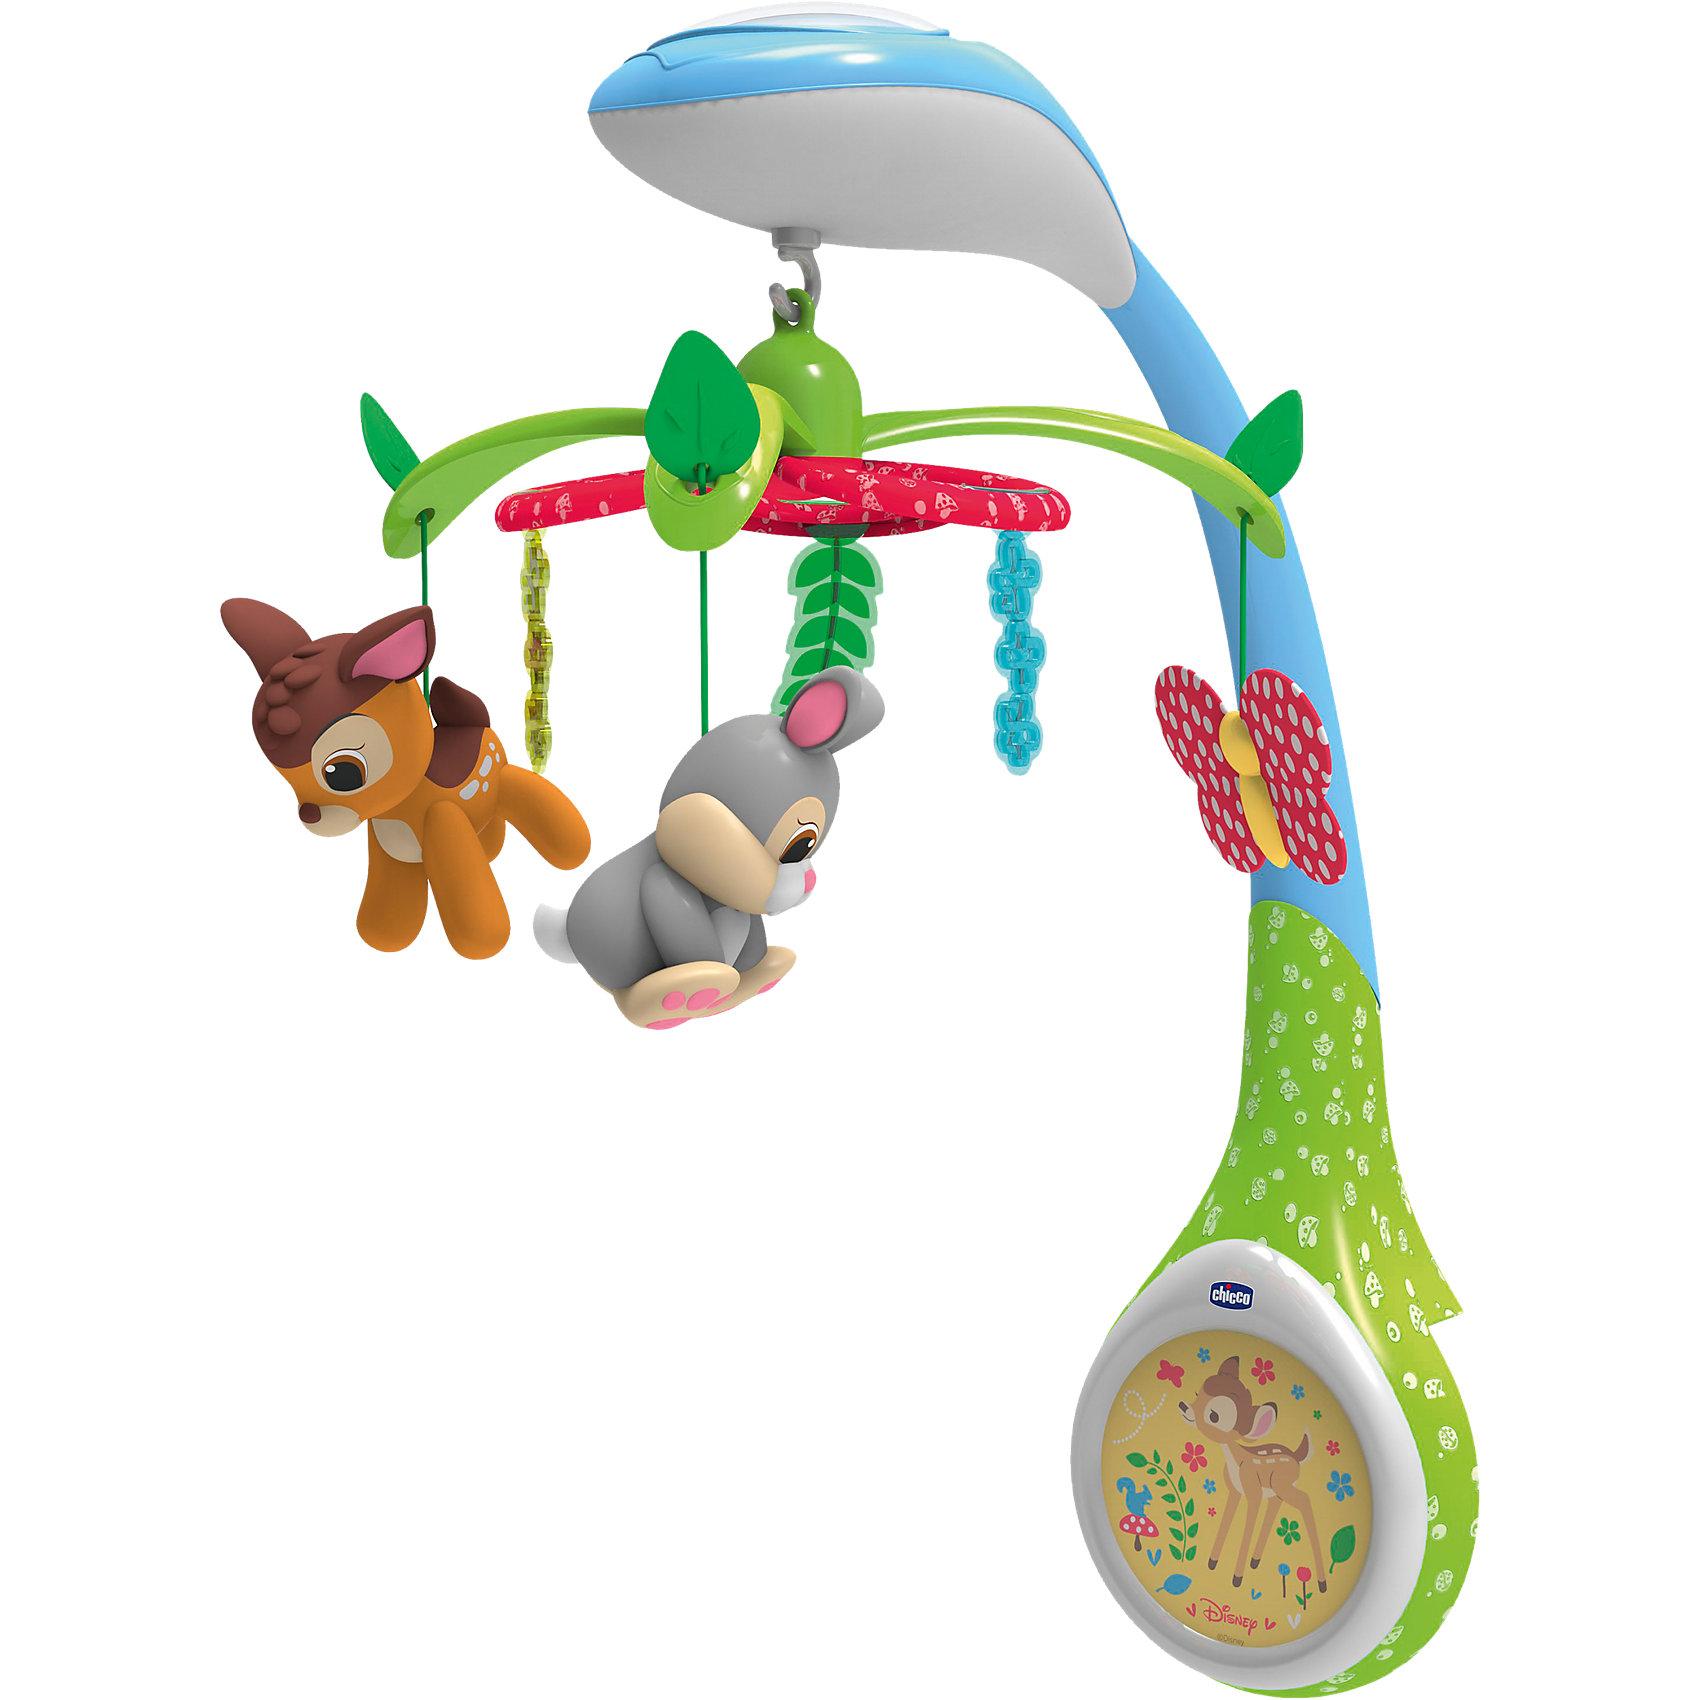 CHICCO Игрушка-проектор для кроватки Бэмби, Disney, CHICCO игрушка подвеска chicco игрушка проектор для кроватки бэмби